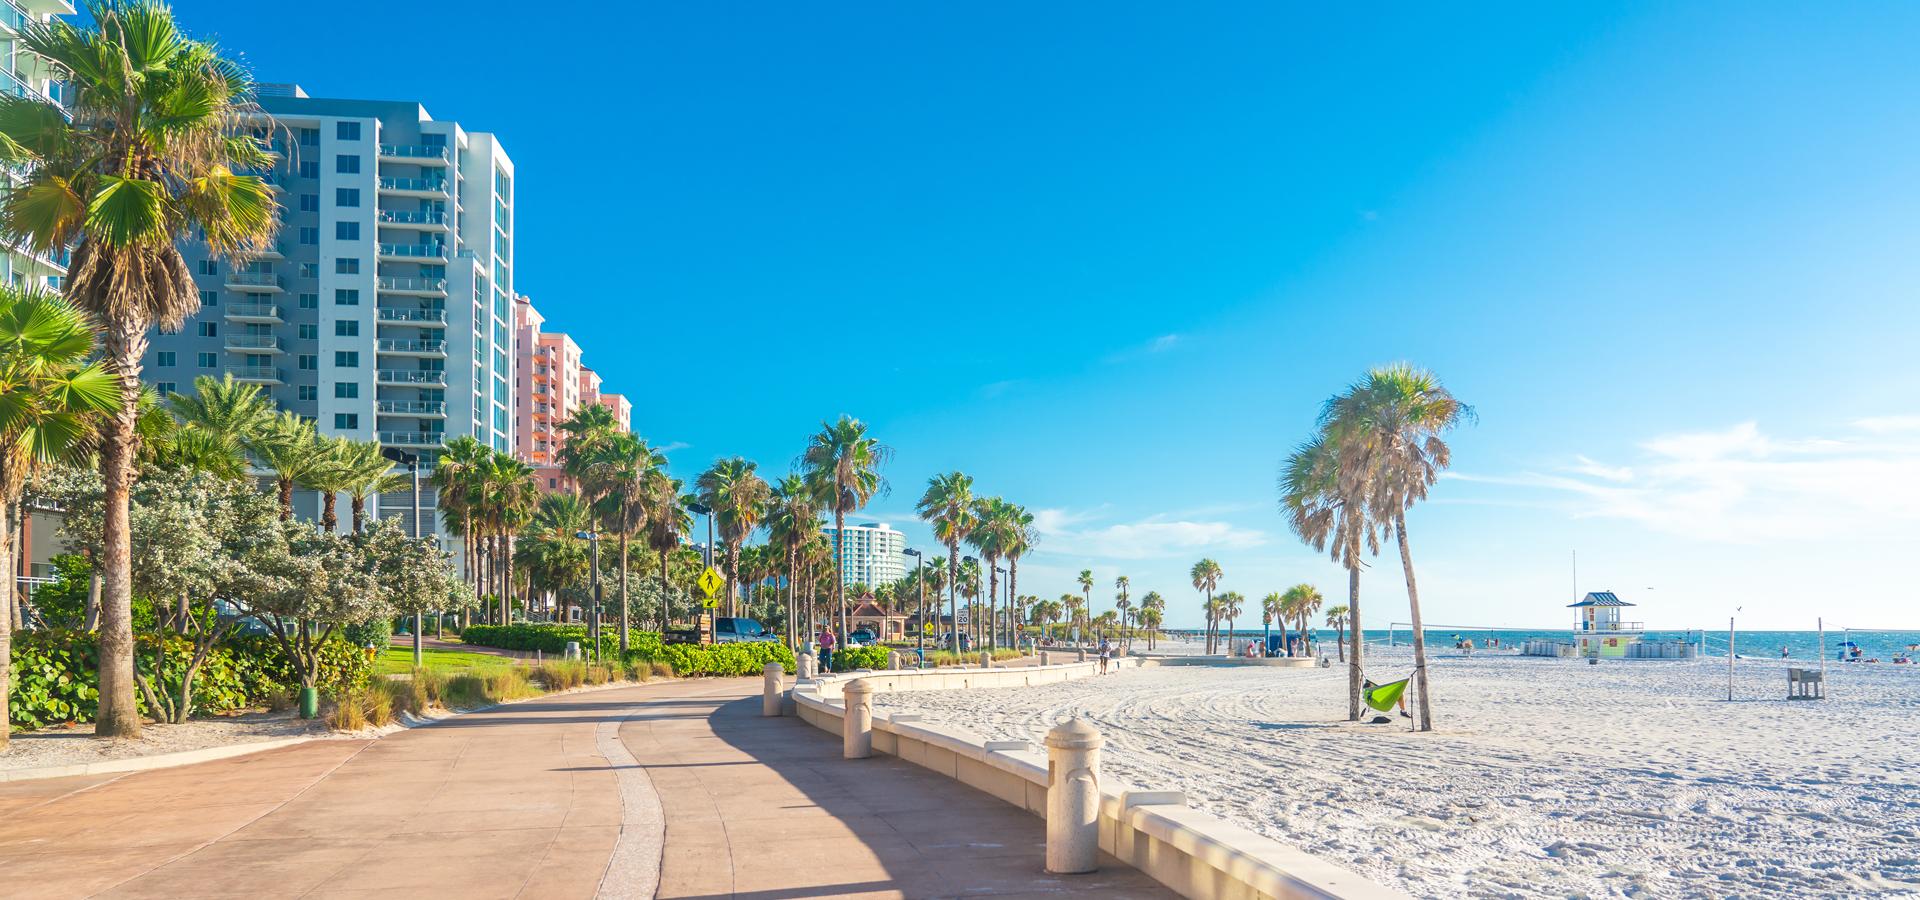 Peer-to-peer advisory in Clearwater, Tampa Bay, Florida